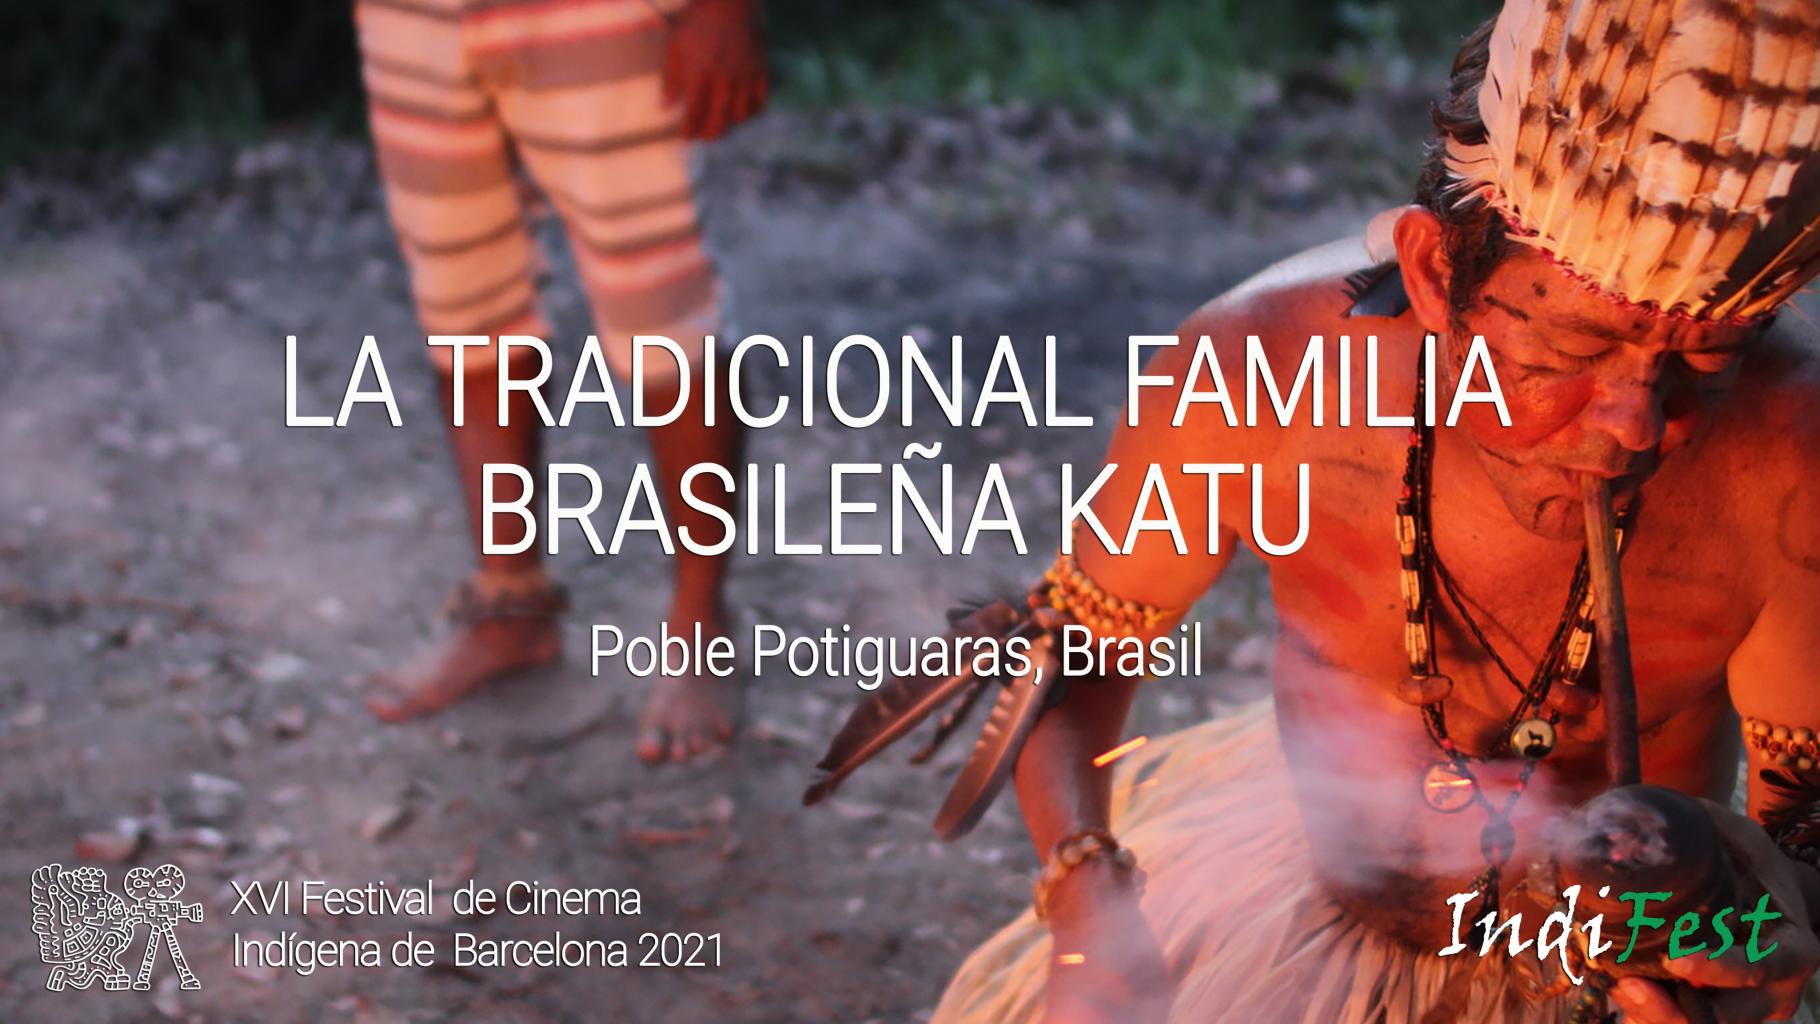 La Tradicional Familia Brasileña KATU cat